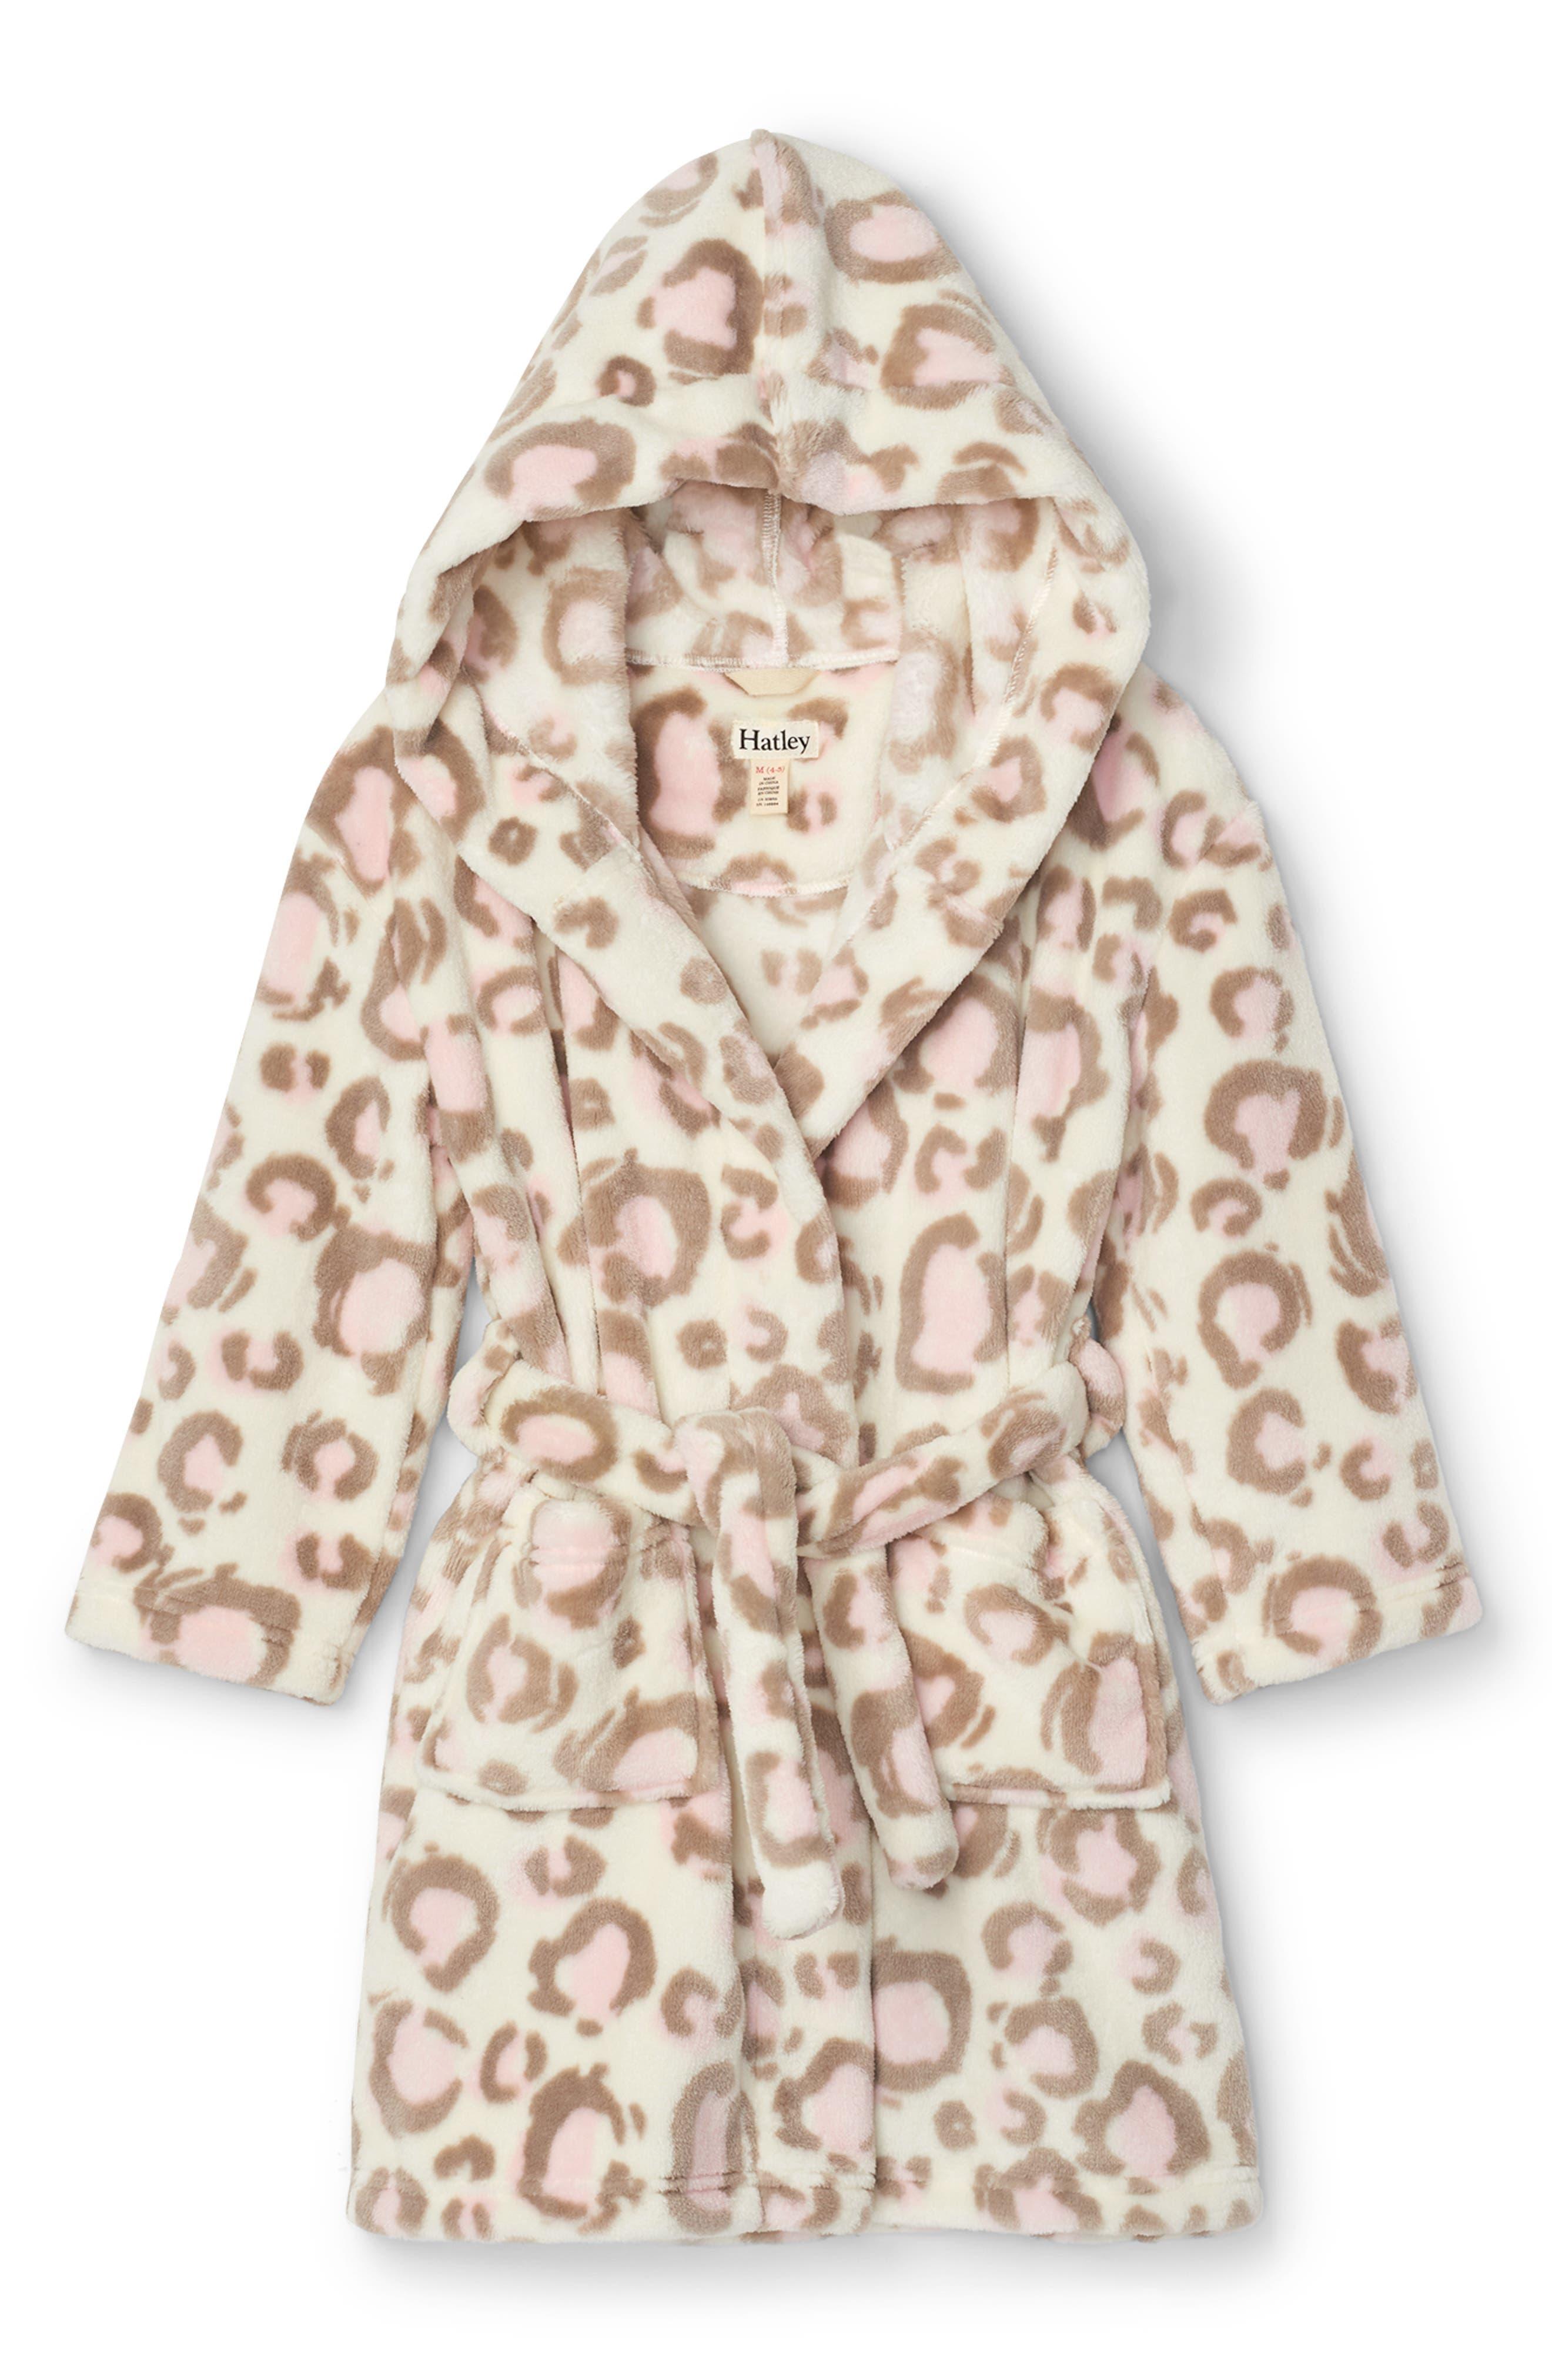 Animal Bathrobe Kids Girls Boys Pajamas Sleepwear Hooded Plush Robe Bath Towel